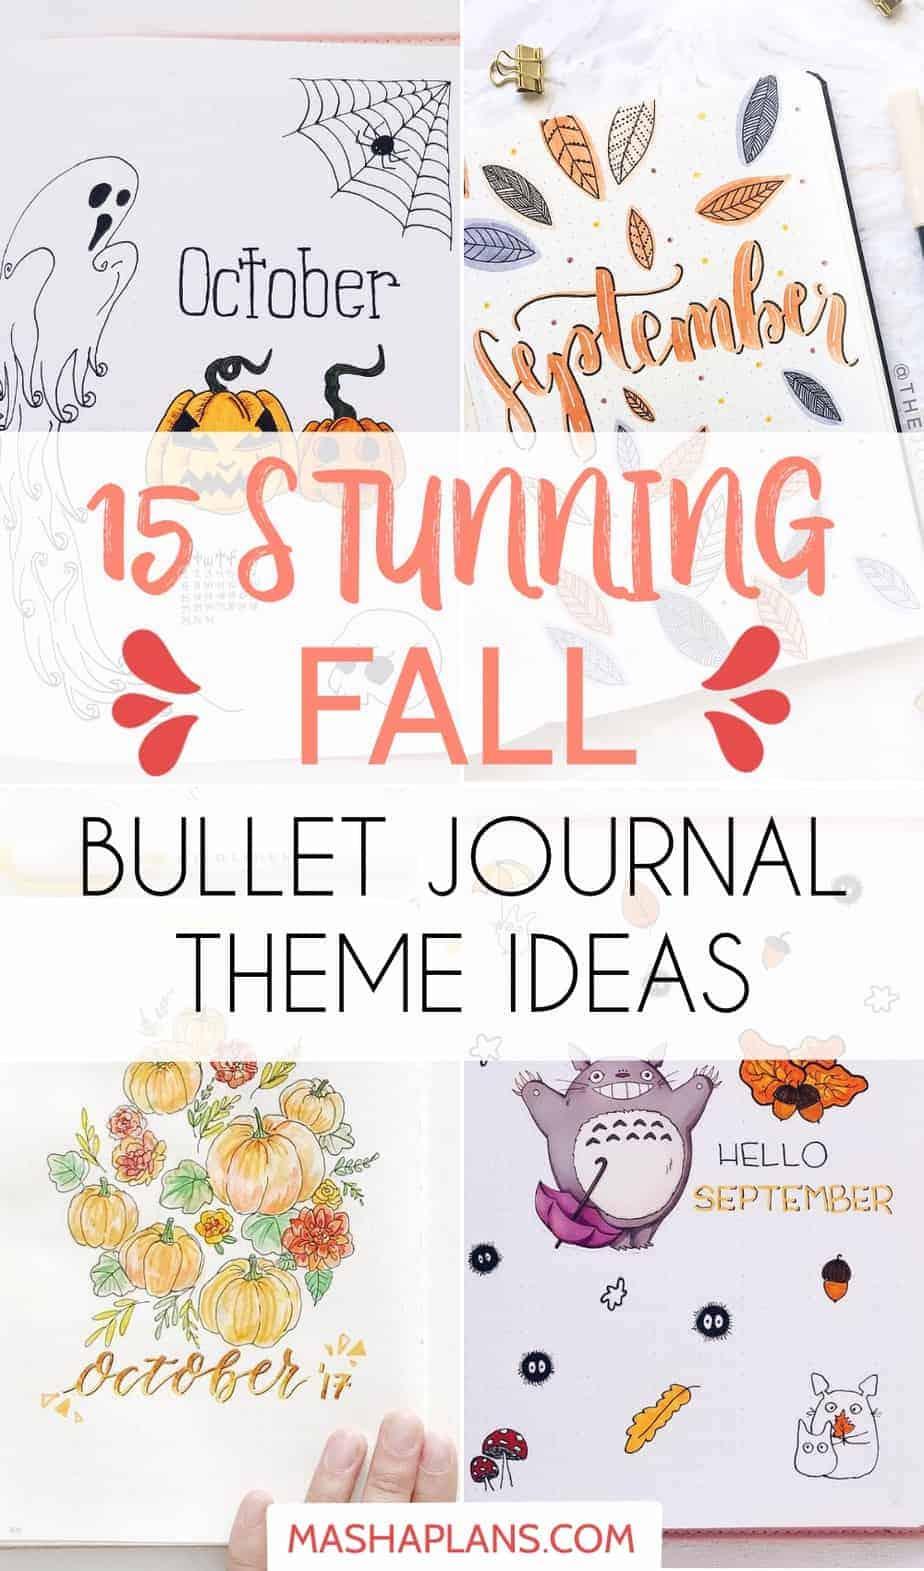 15 Stunning Fall Bullet Journal Theme Ideas | Masha Plans